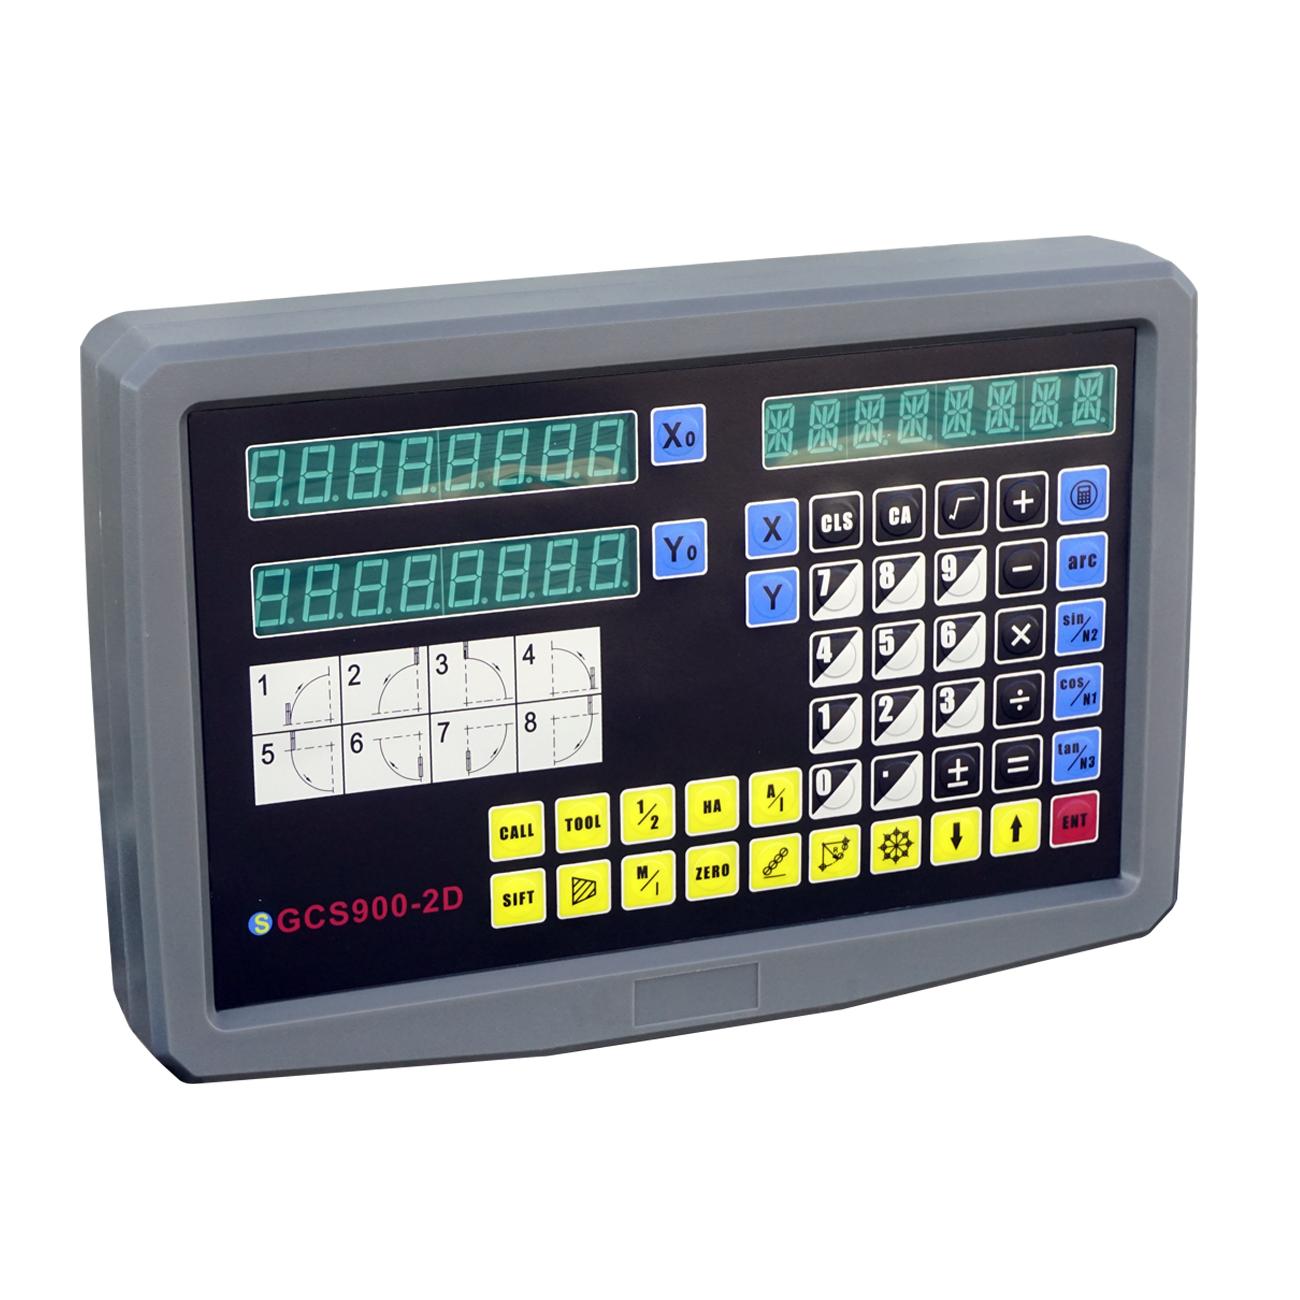 Digital Readout Dro Kit Display Meter For Milling Lathe